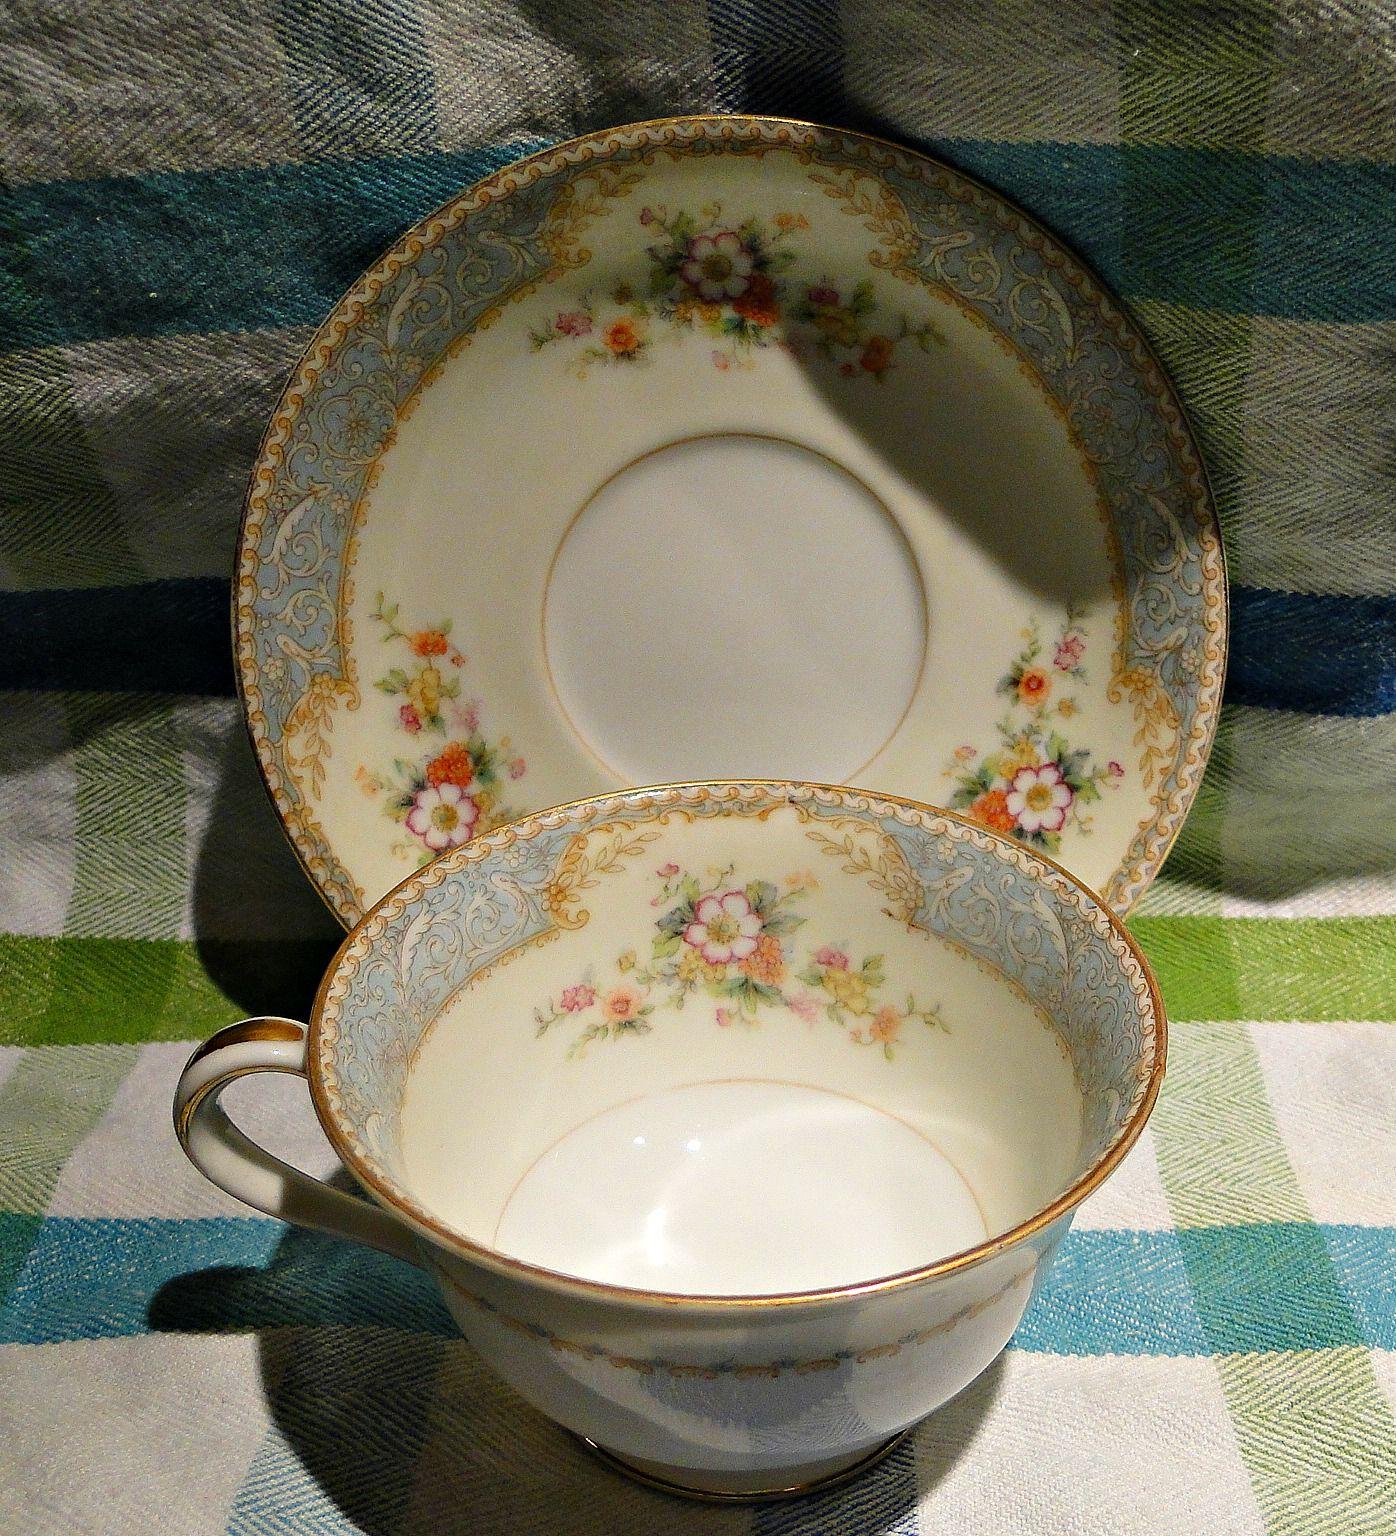 Noritake China Occupied Japan | Tea Cups and Tea Pots & more ...